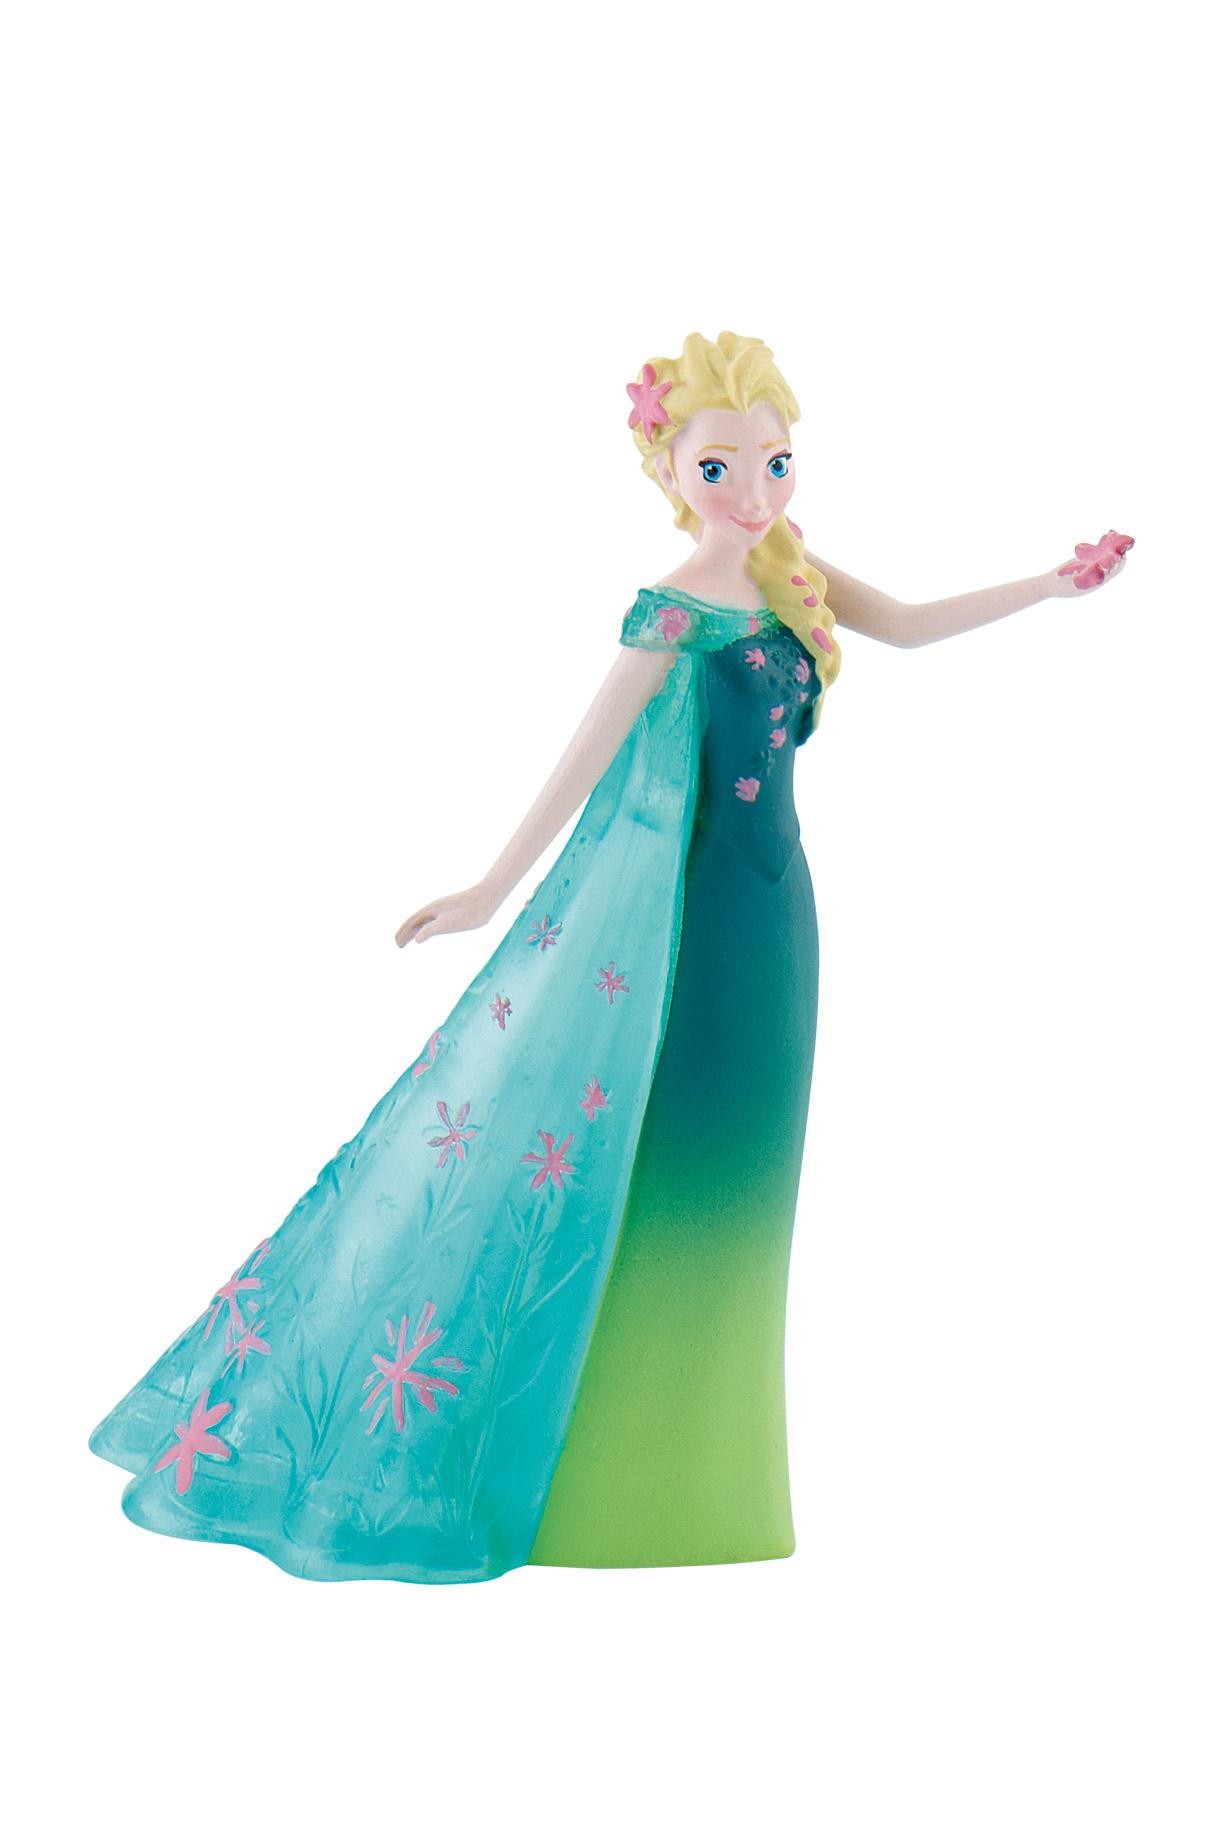 Figurine La Reine Des Neiges Disney - Elsa robe verte - 11 cm